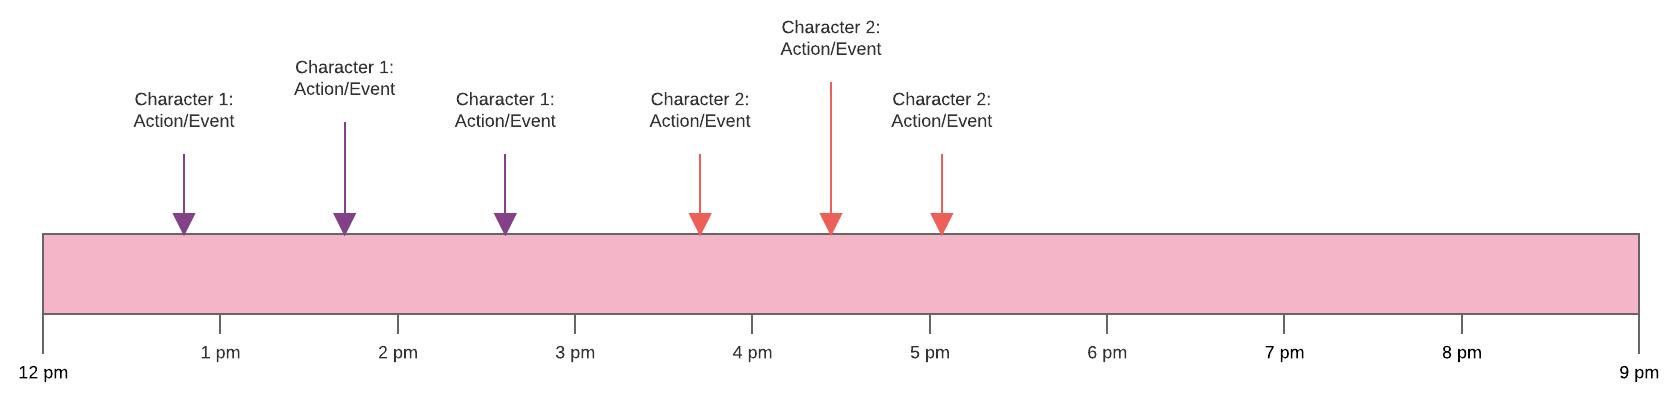 short story timeline